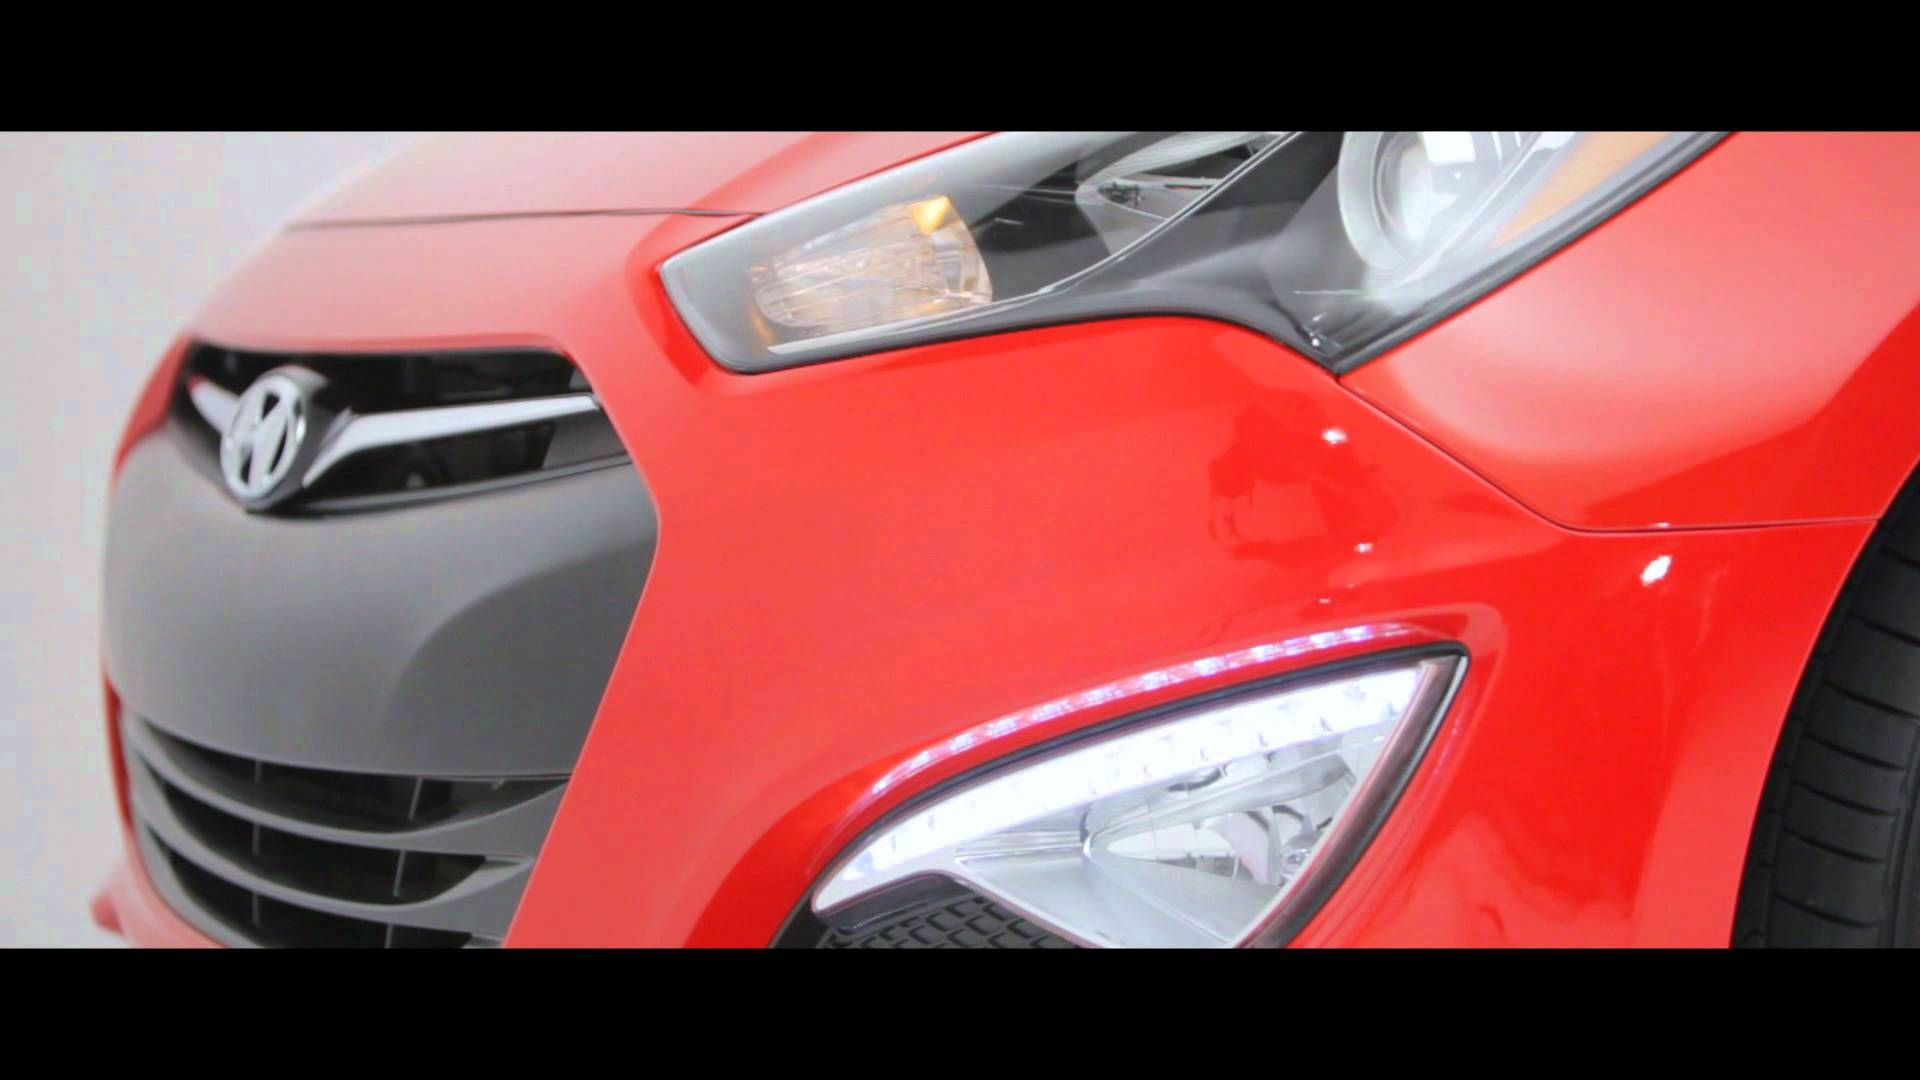 2013 Hyundai Genesis Coupe Video Tour Visit http//www